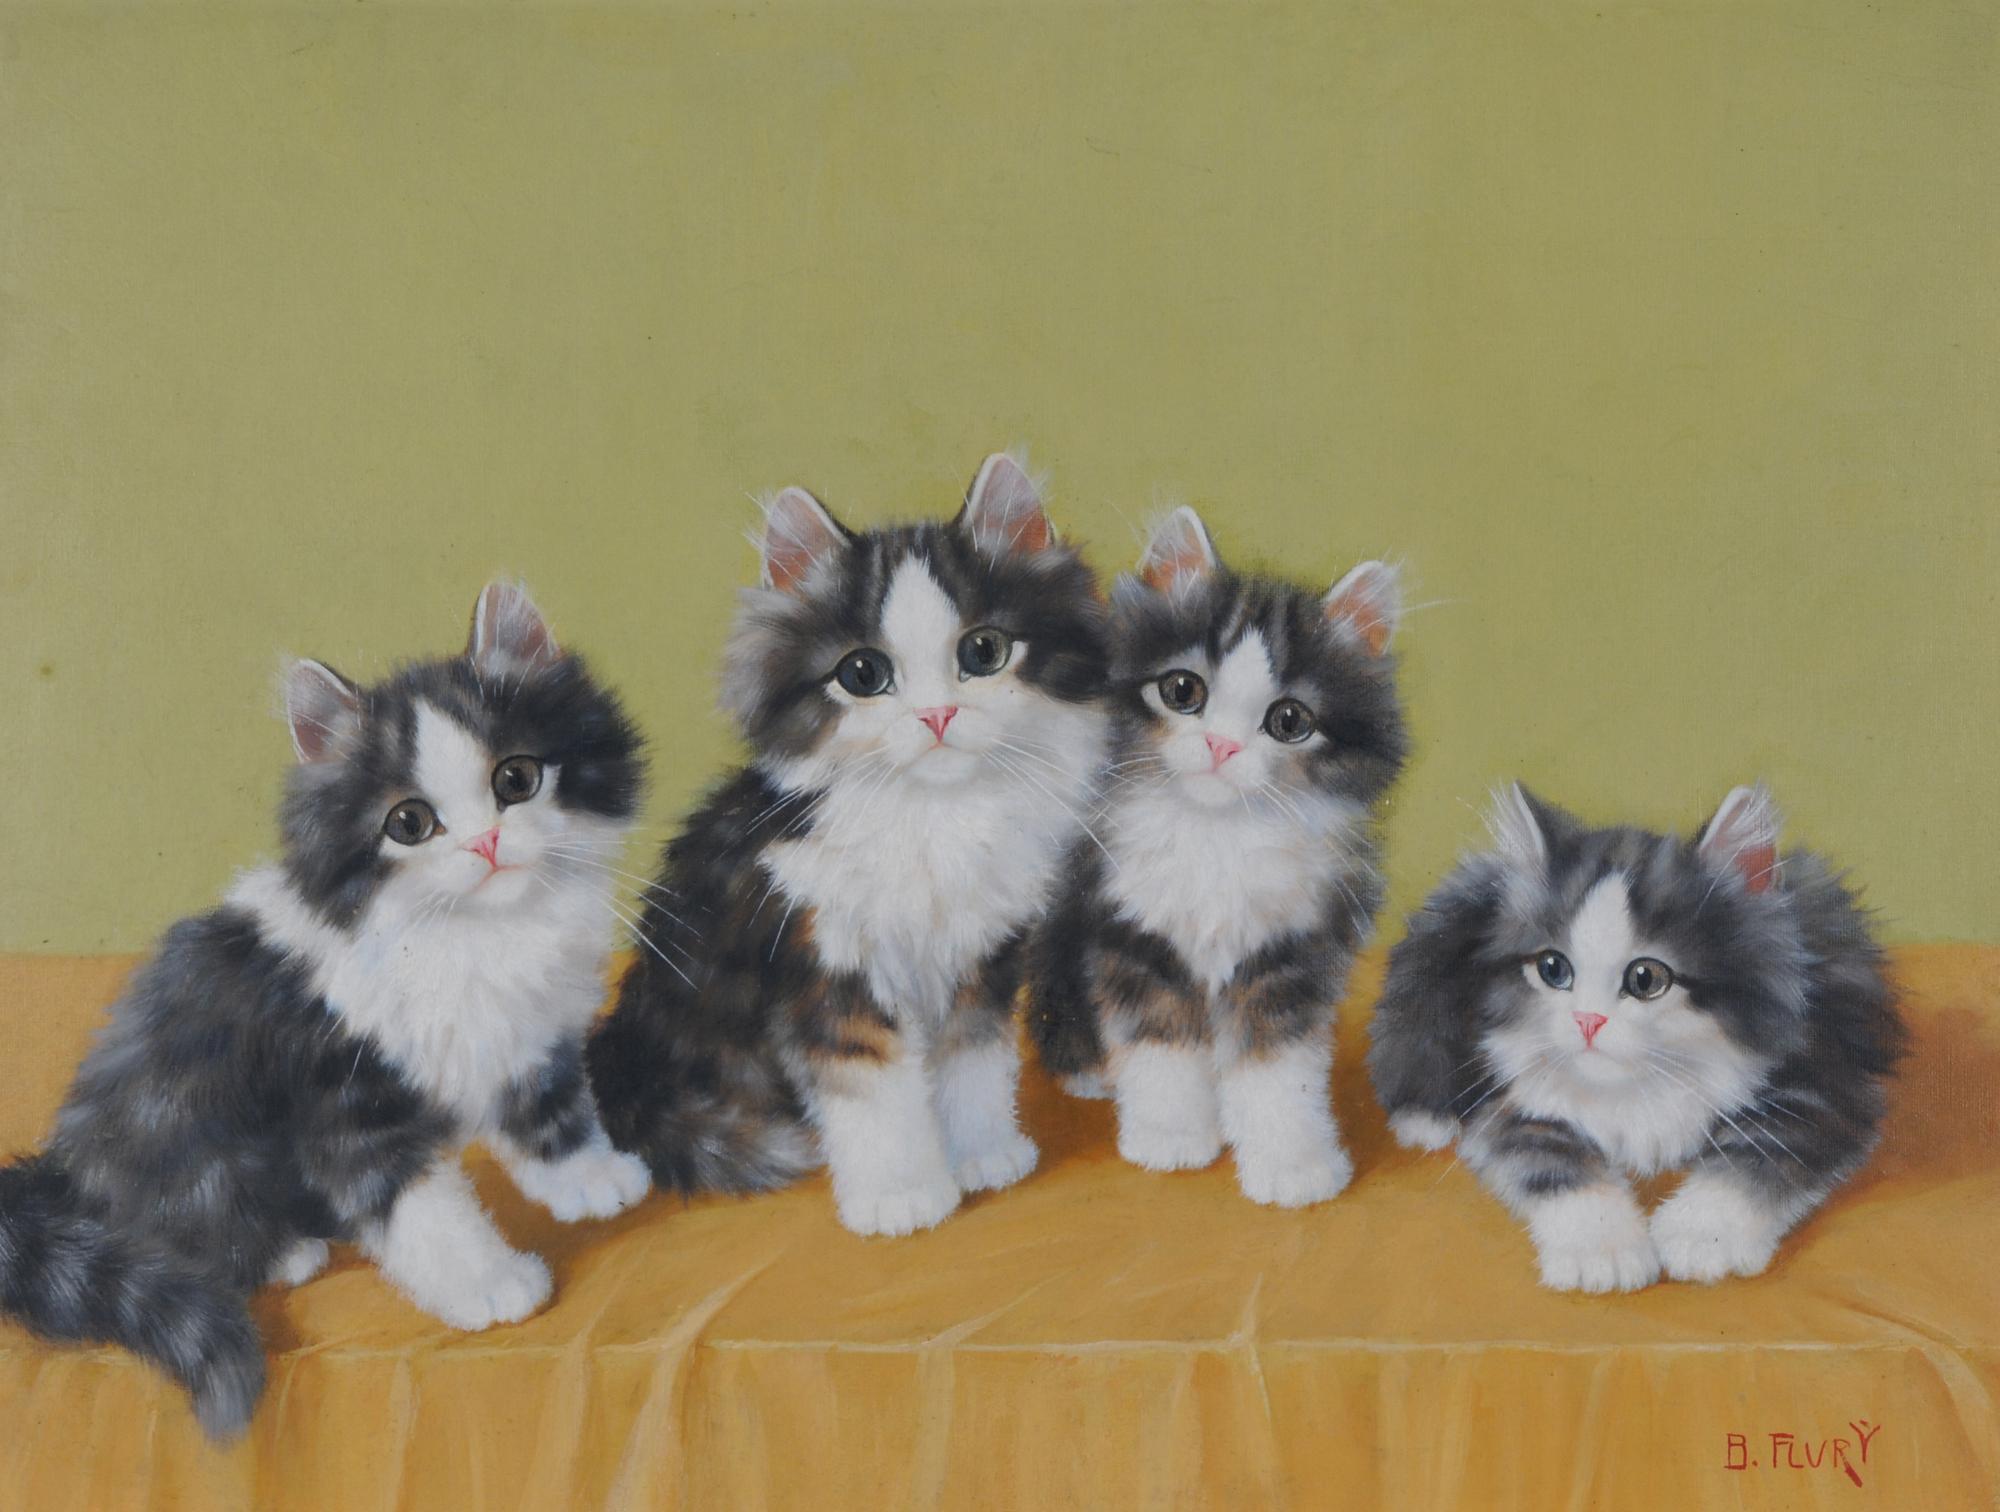 Flury Burkhard, Vier Kätzchen (Four Kittens)